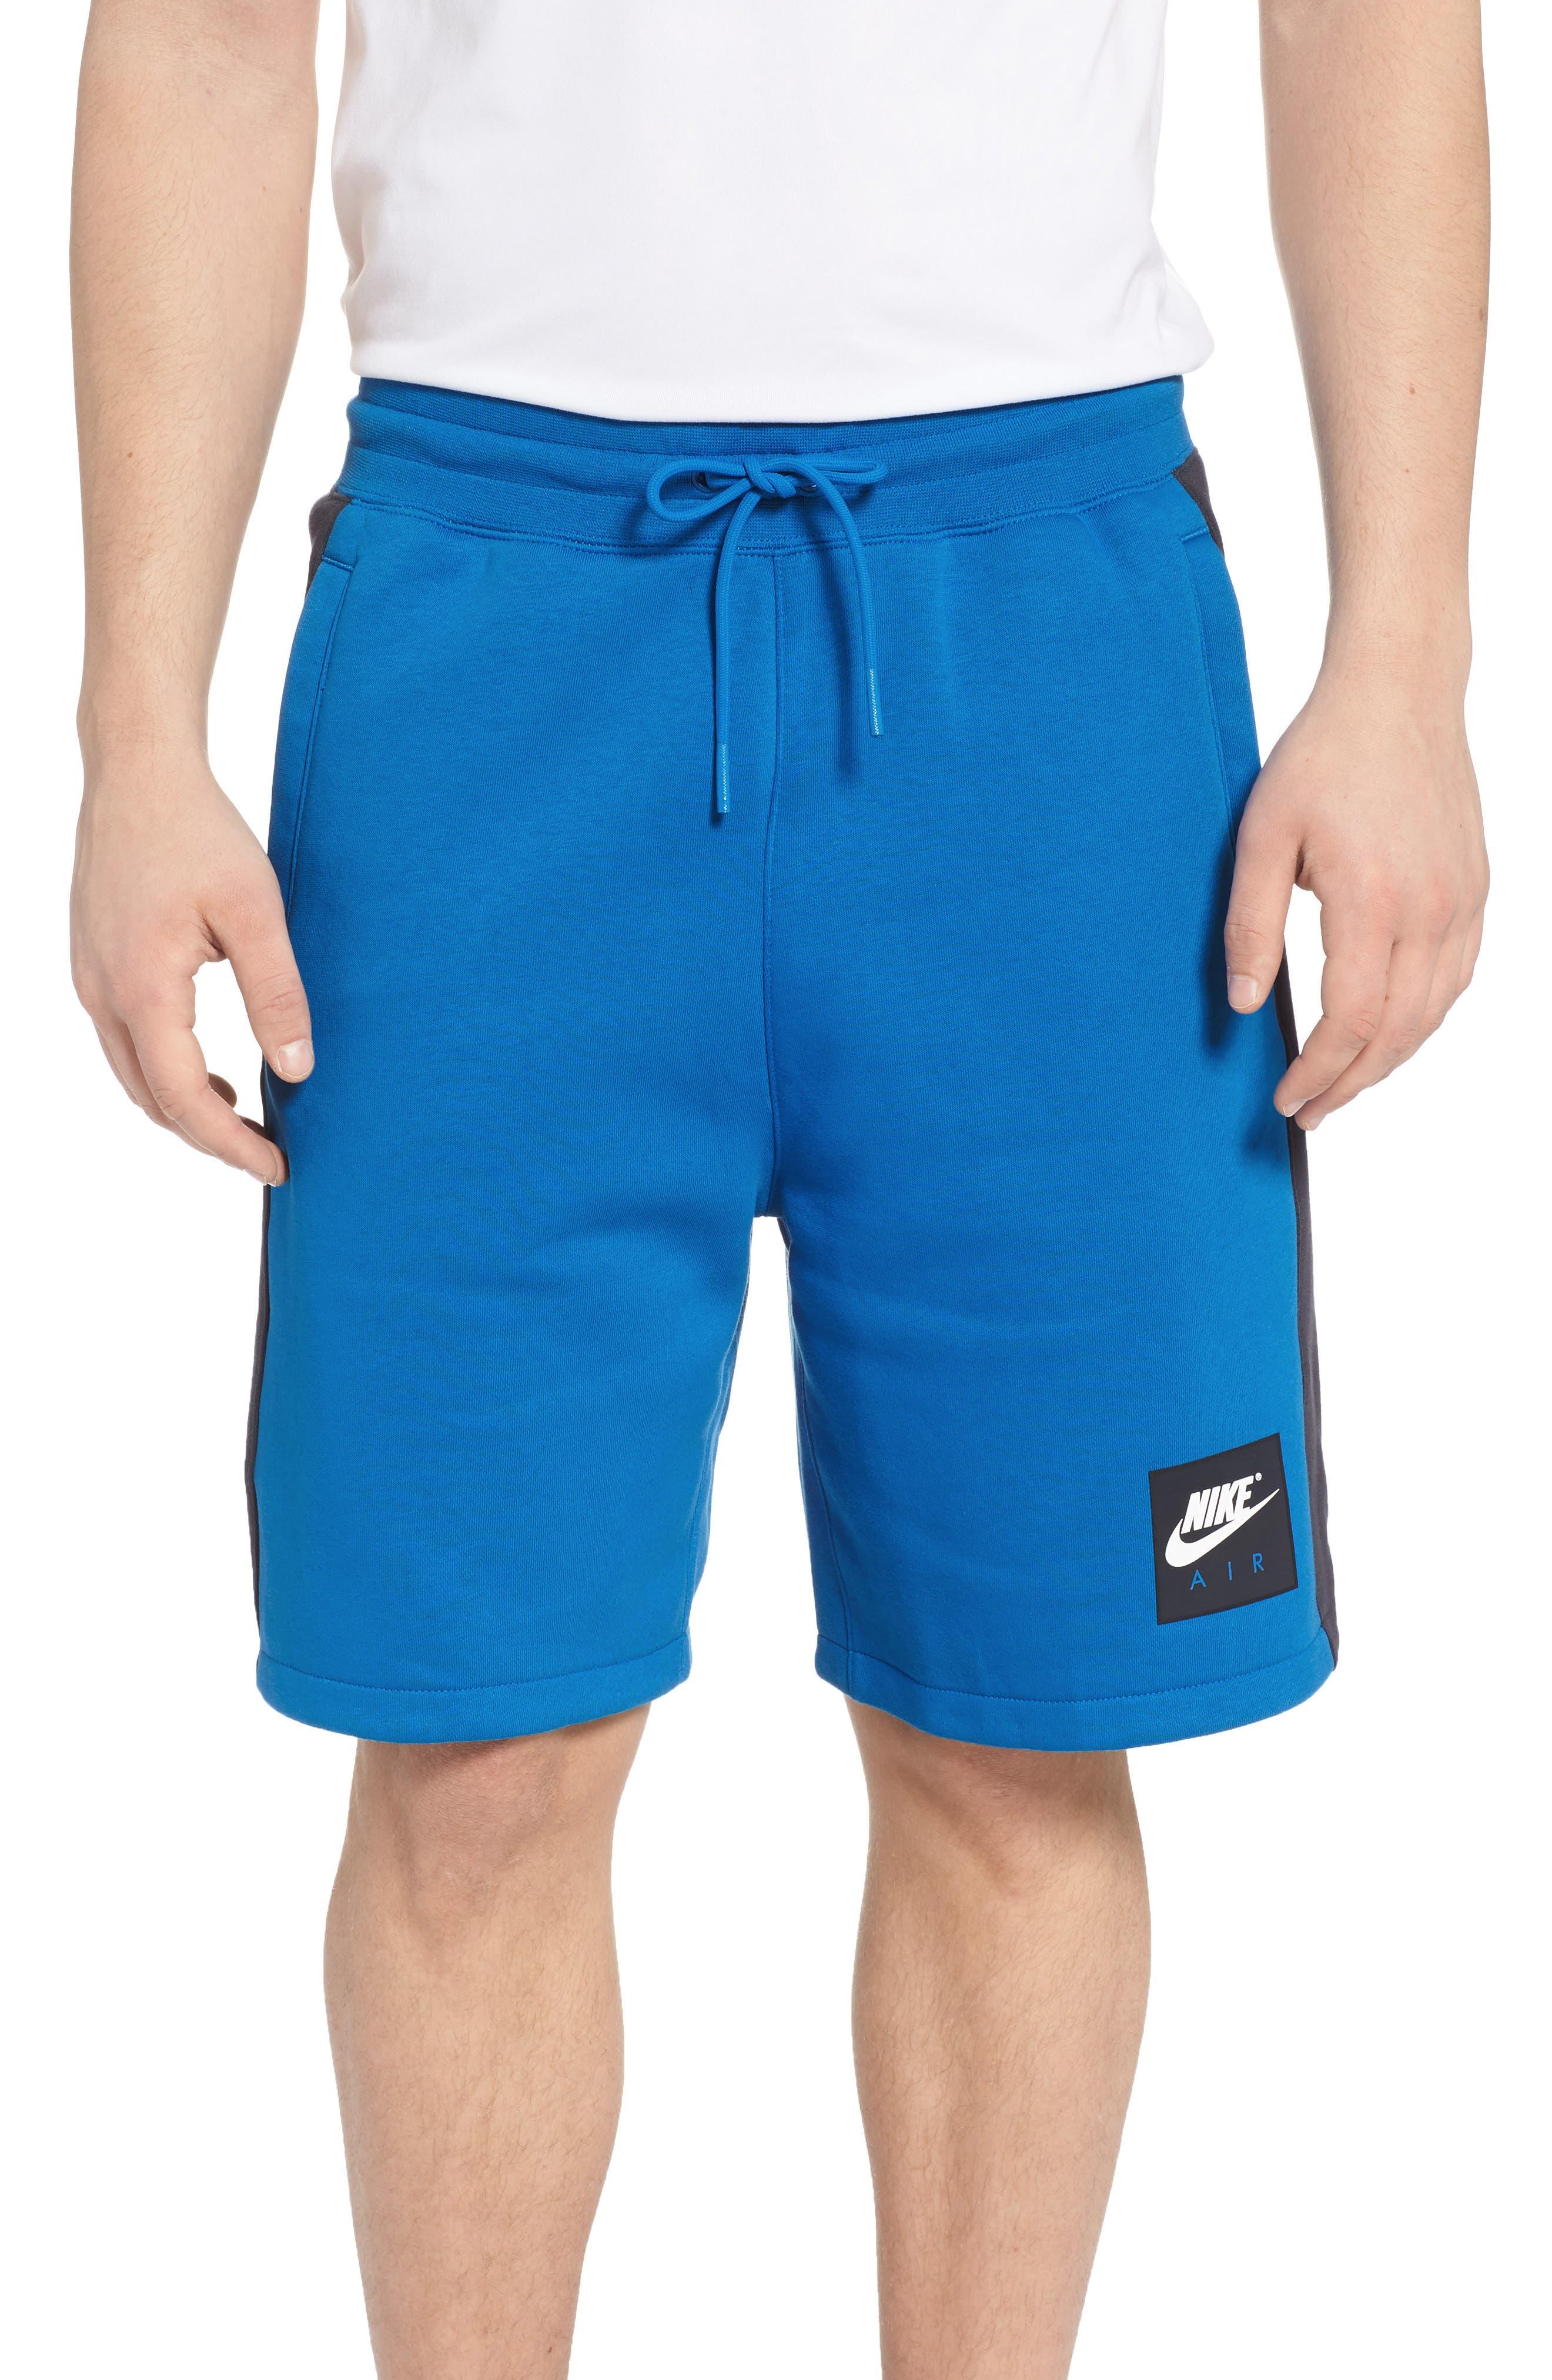 Sportswear Air Fleece Shorts,                             Main thumbnail 1, color,                             Blue Nebula/ Anthracite/ White